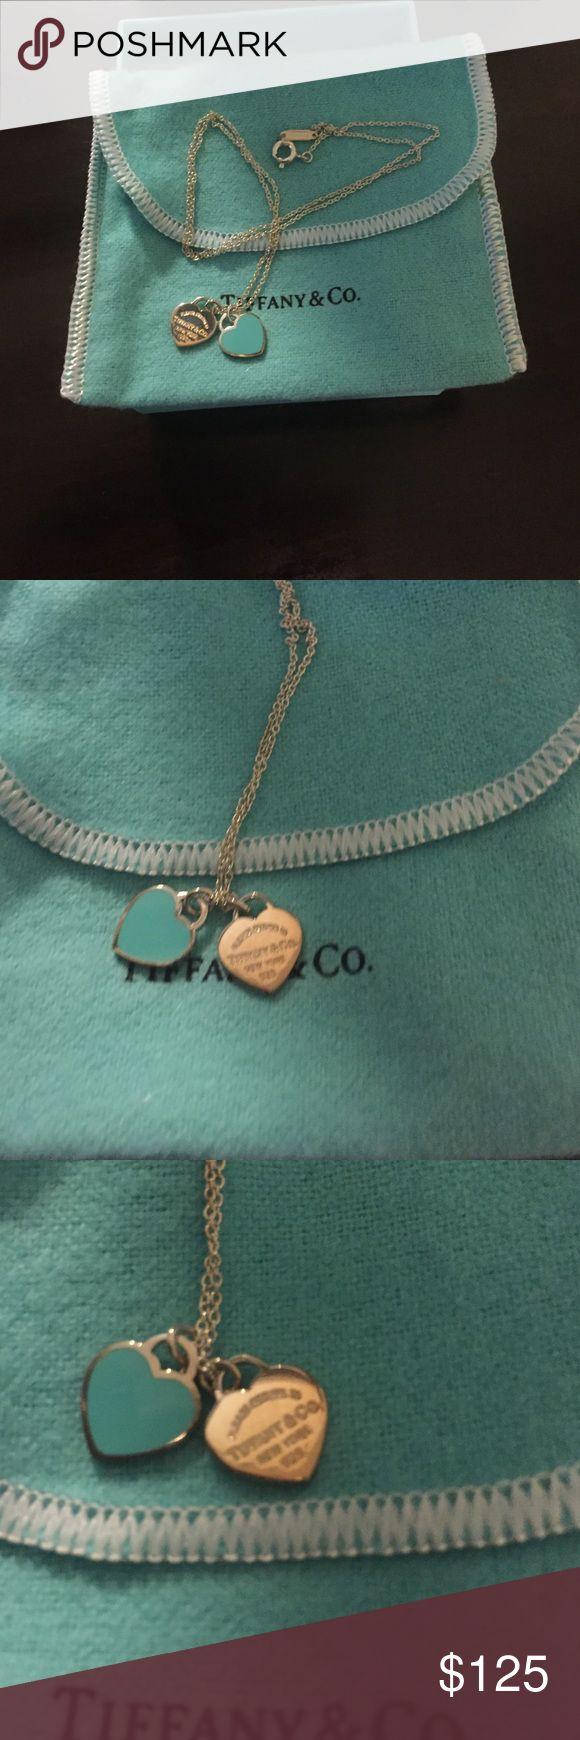 New Tiffany &Co double heart necklace New Tiffany &Co. Necklace Double Hearts Tiffany & Co. Jewelry Necklaces